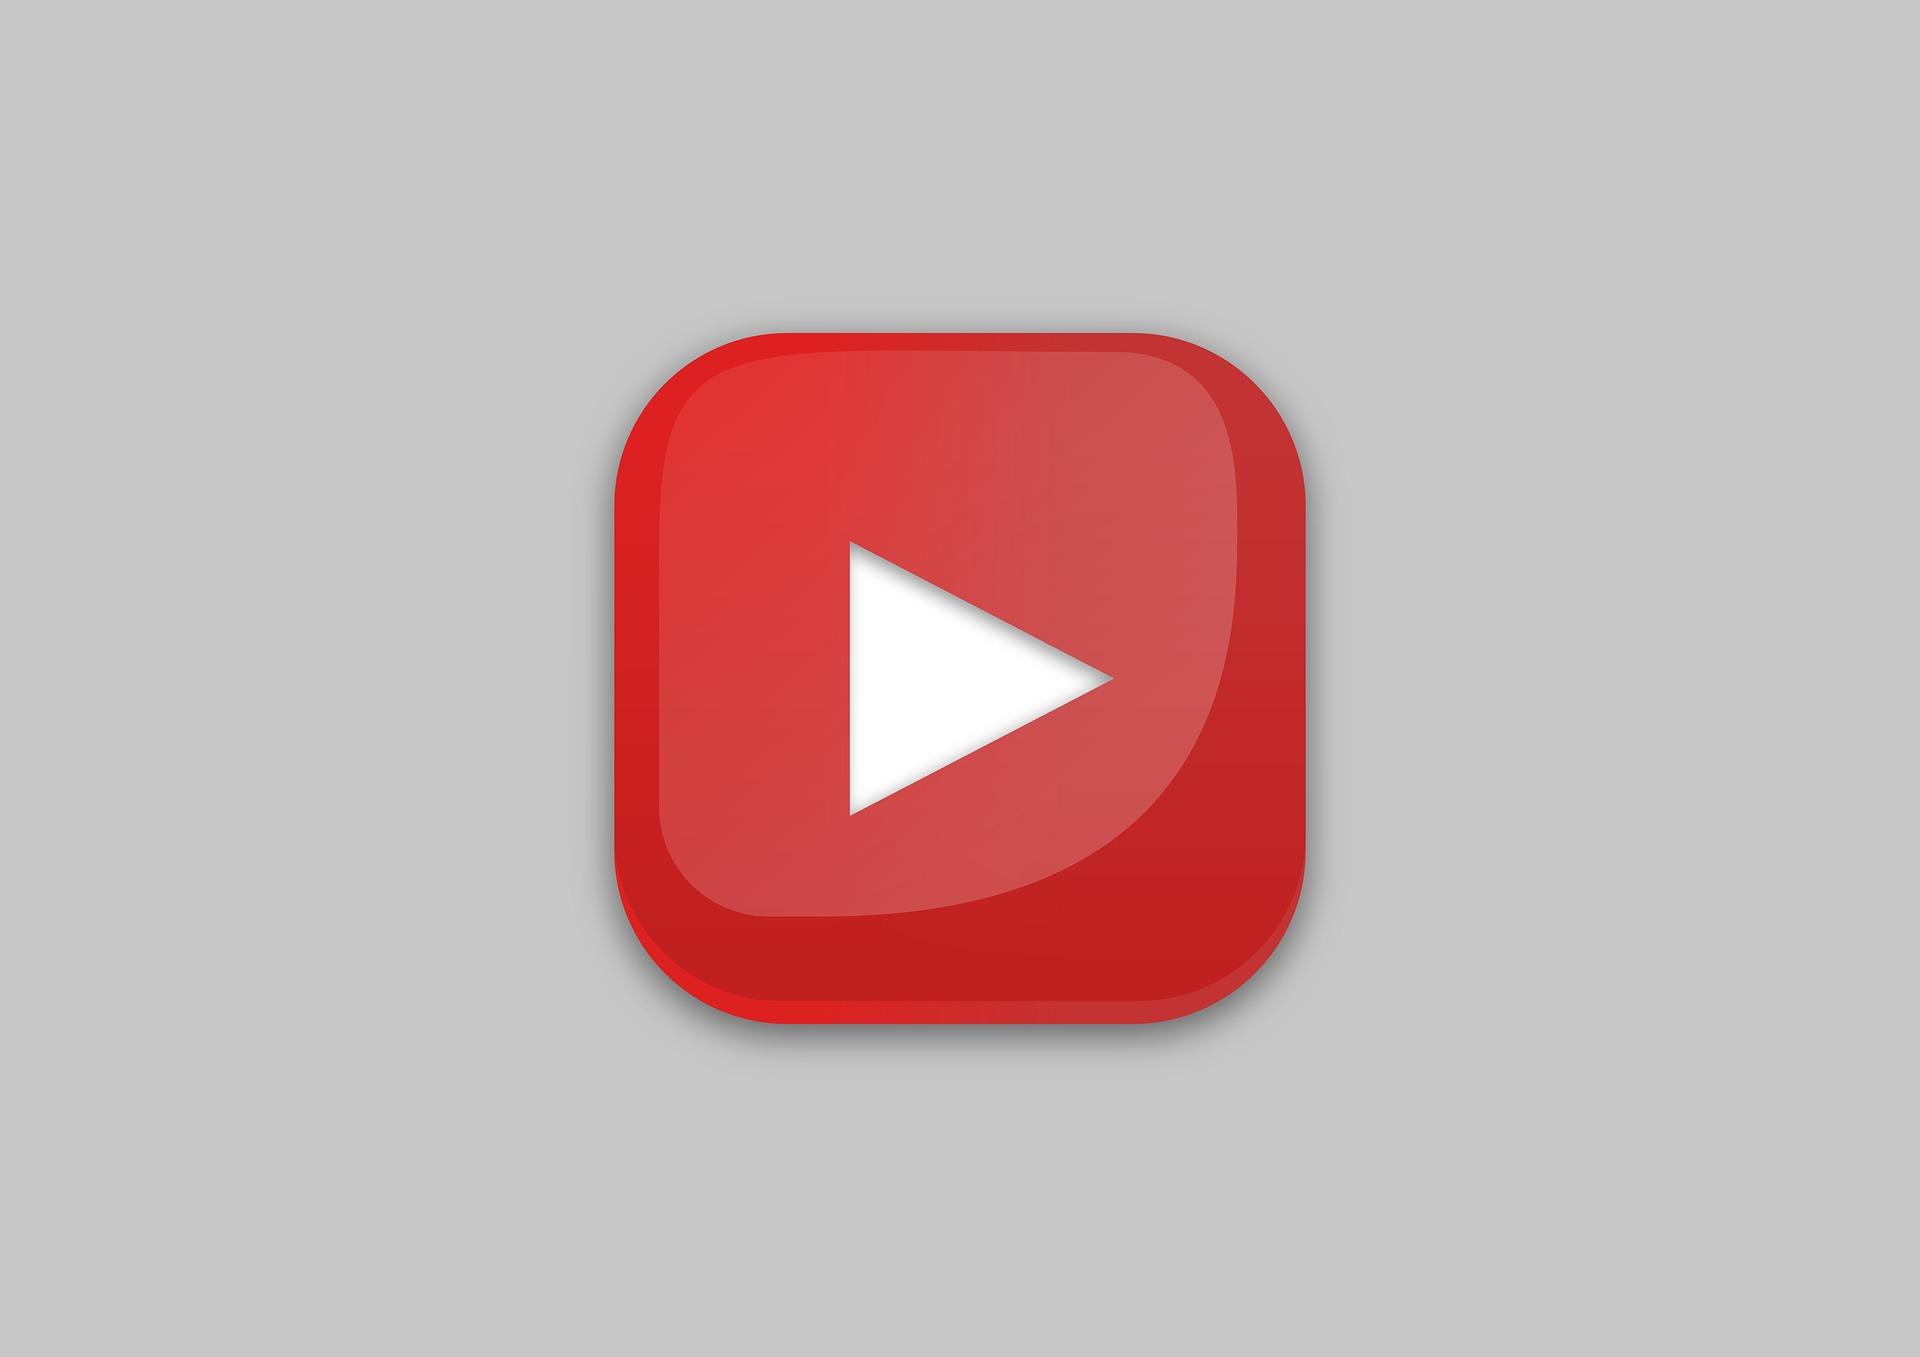 youtube-3216705_1920.jpg